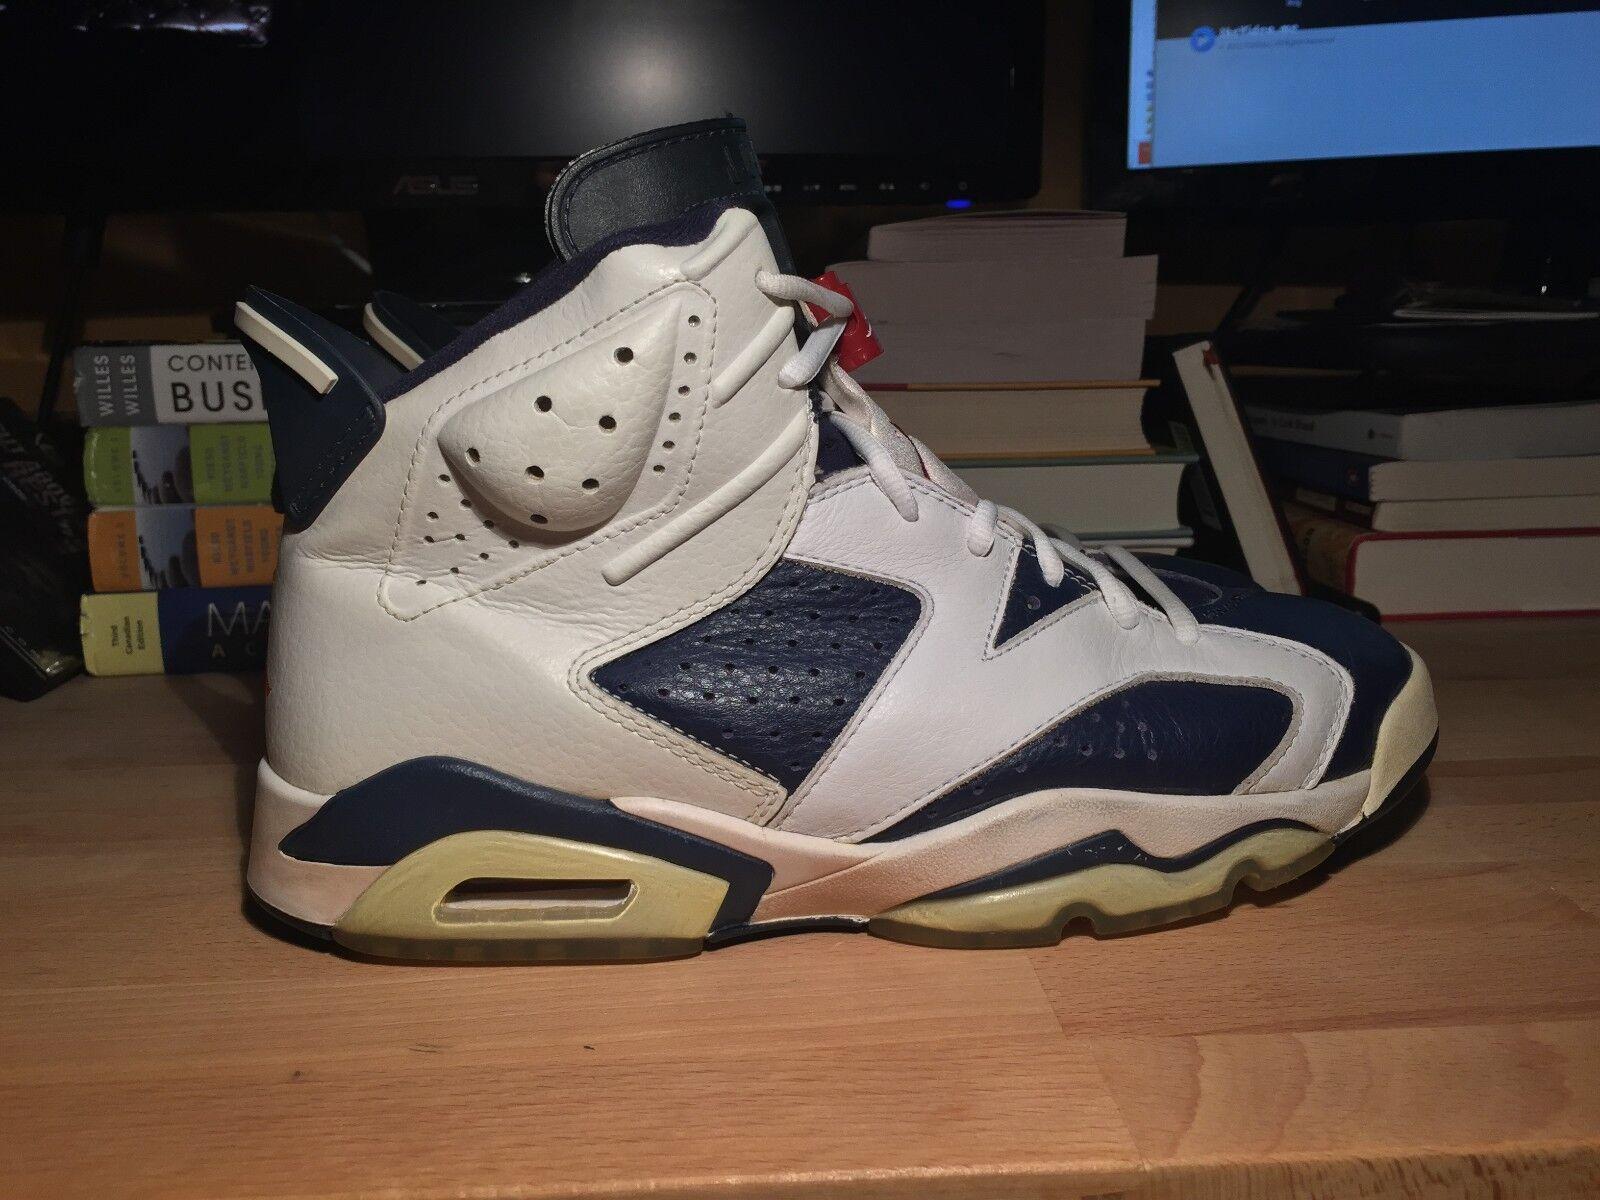 Jordan 6 - Olympic - 2000 - Size 10.5 VNDS